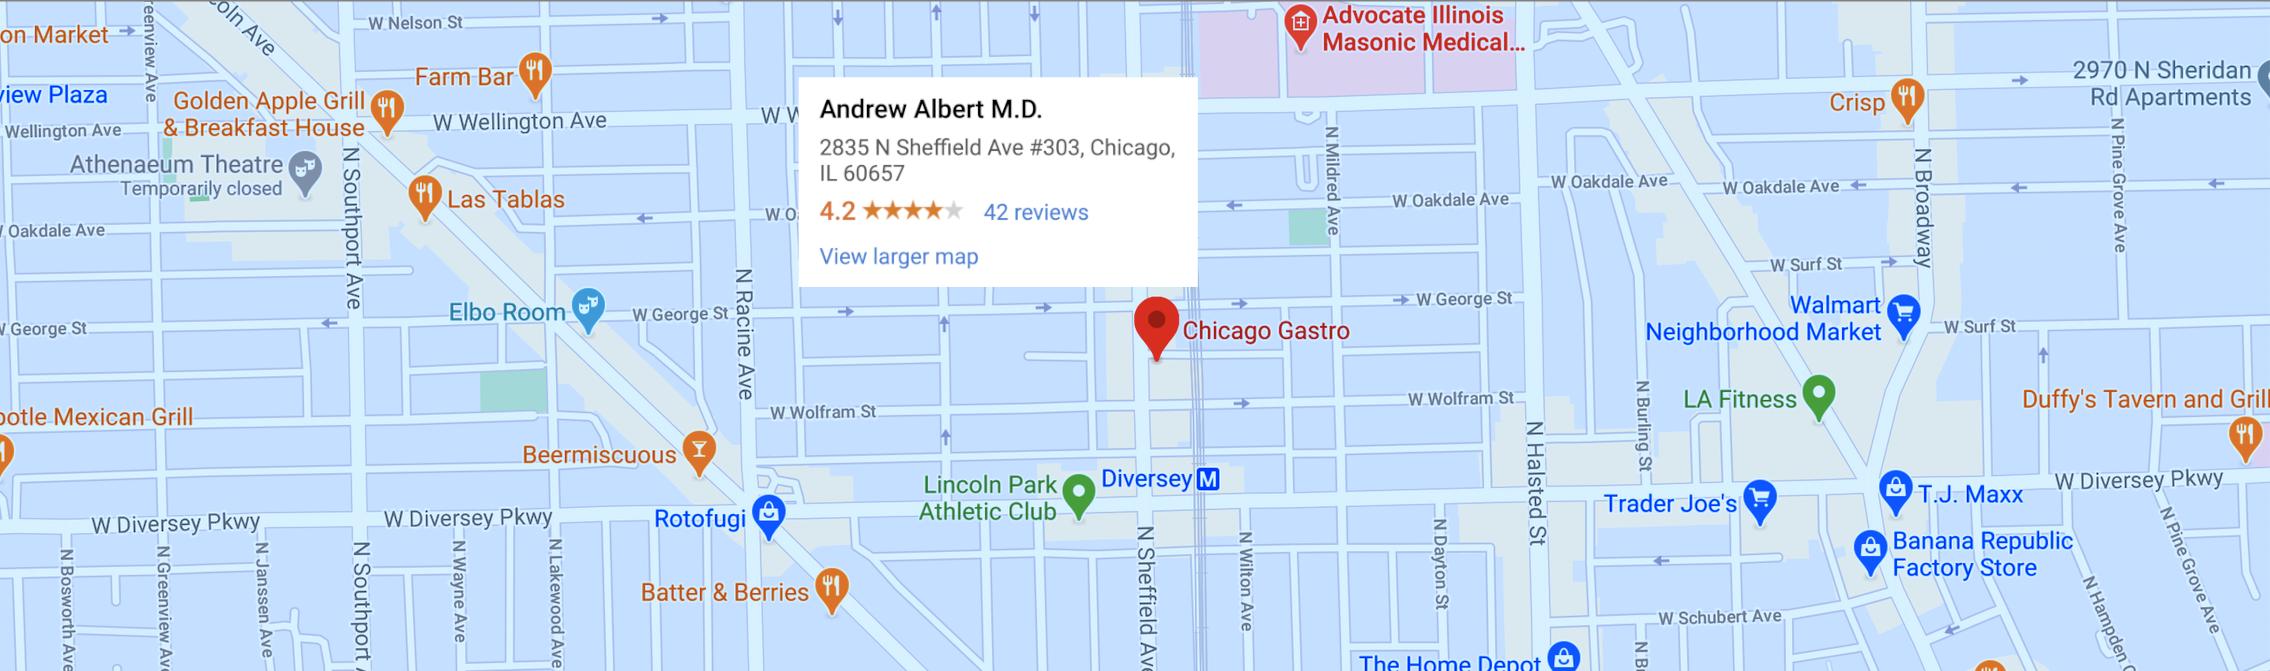 chicago-gastro-location